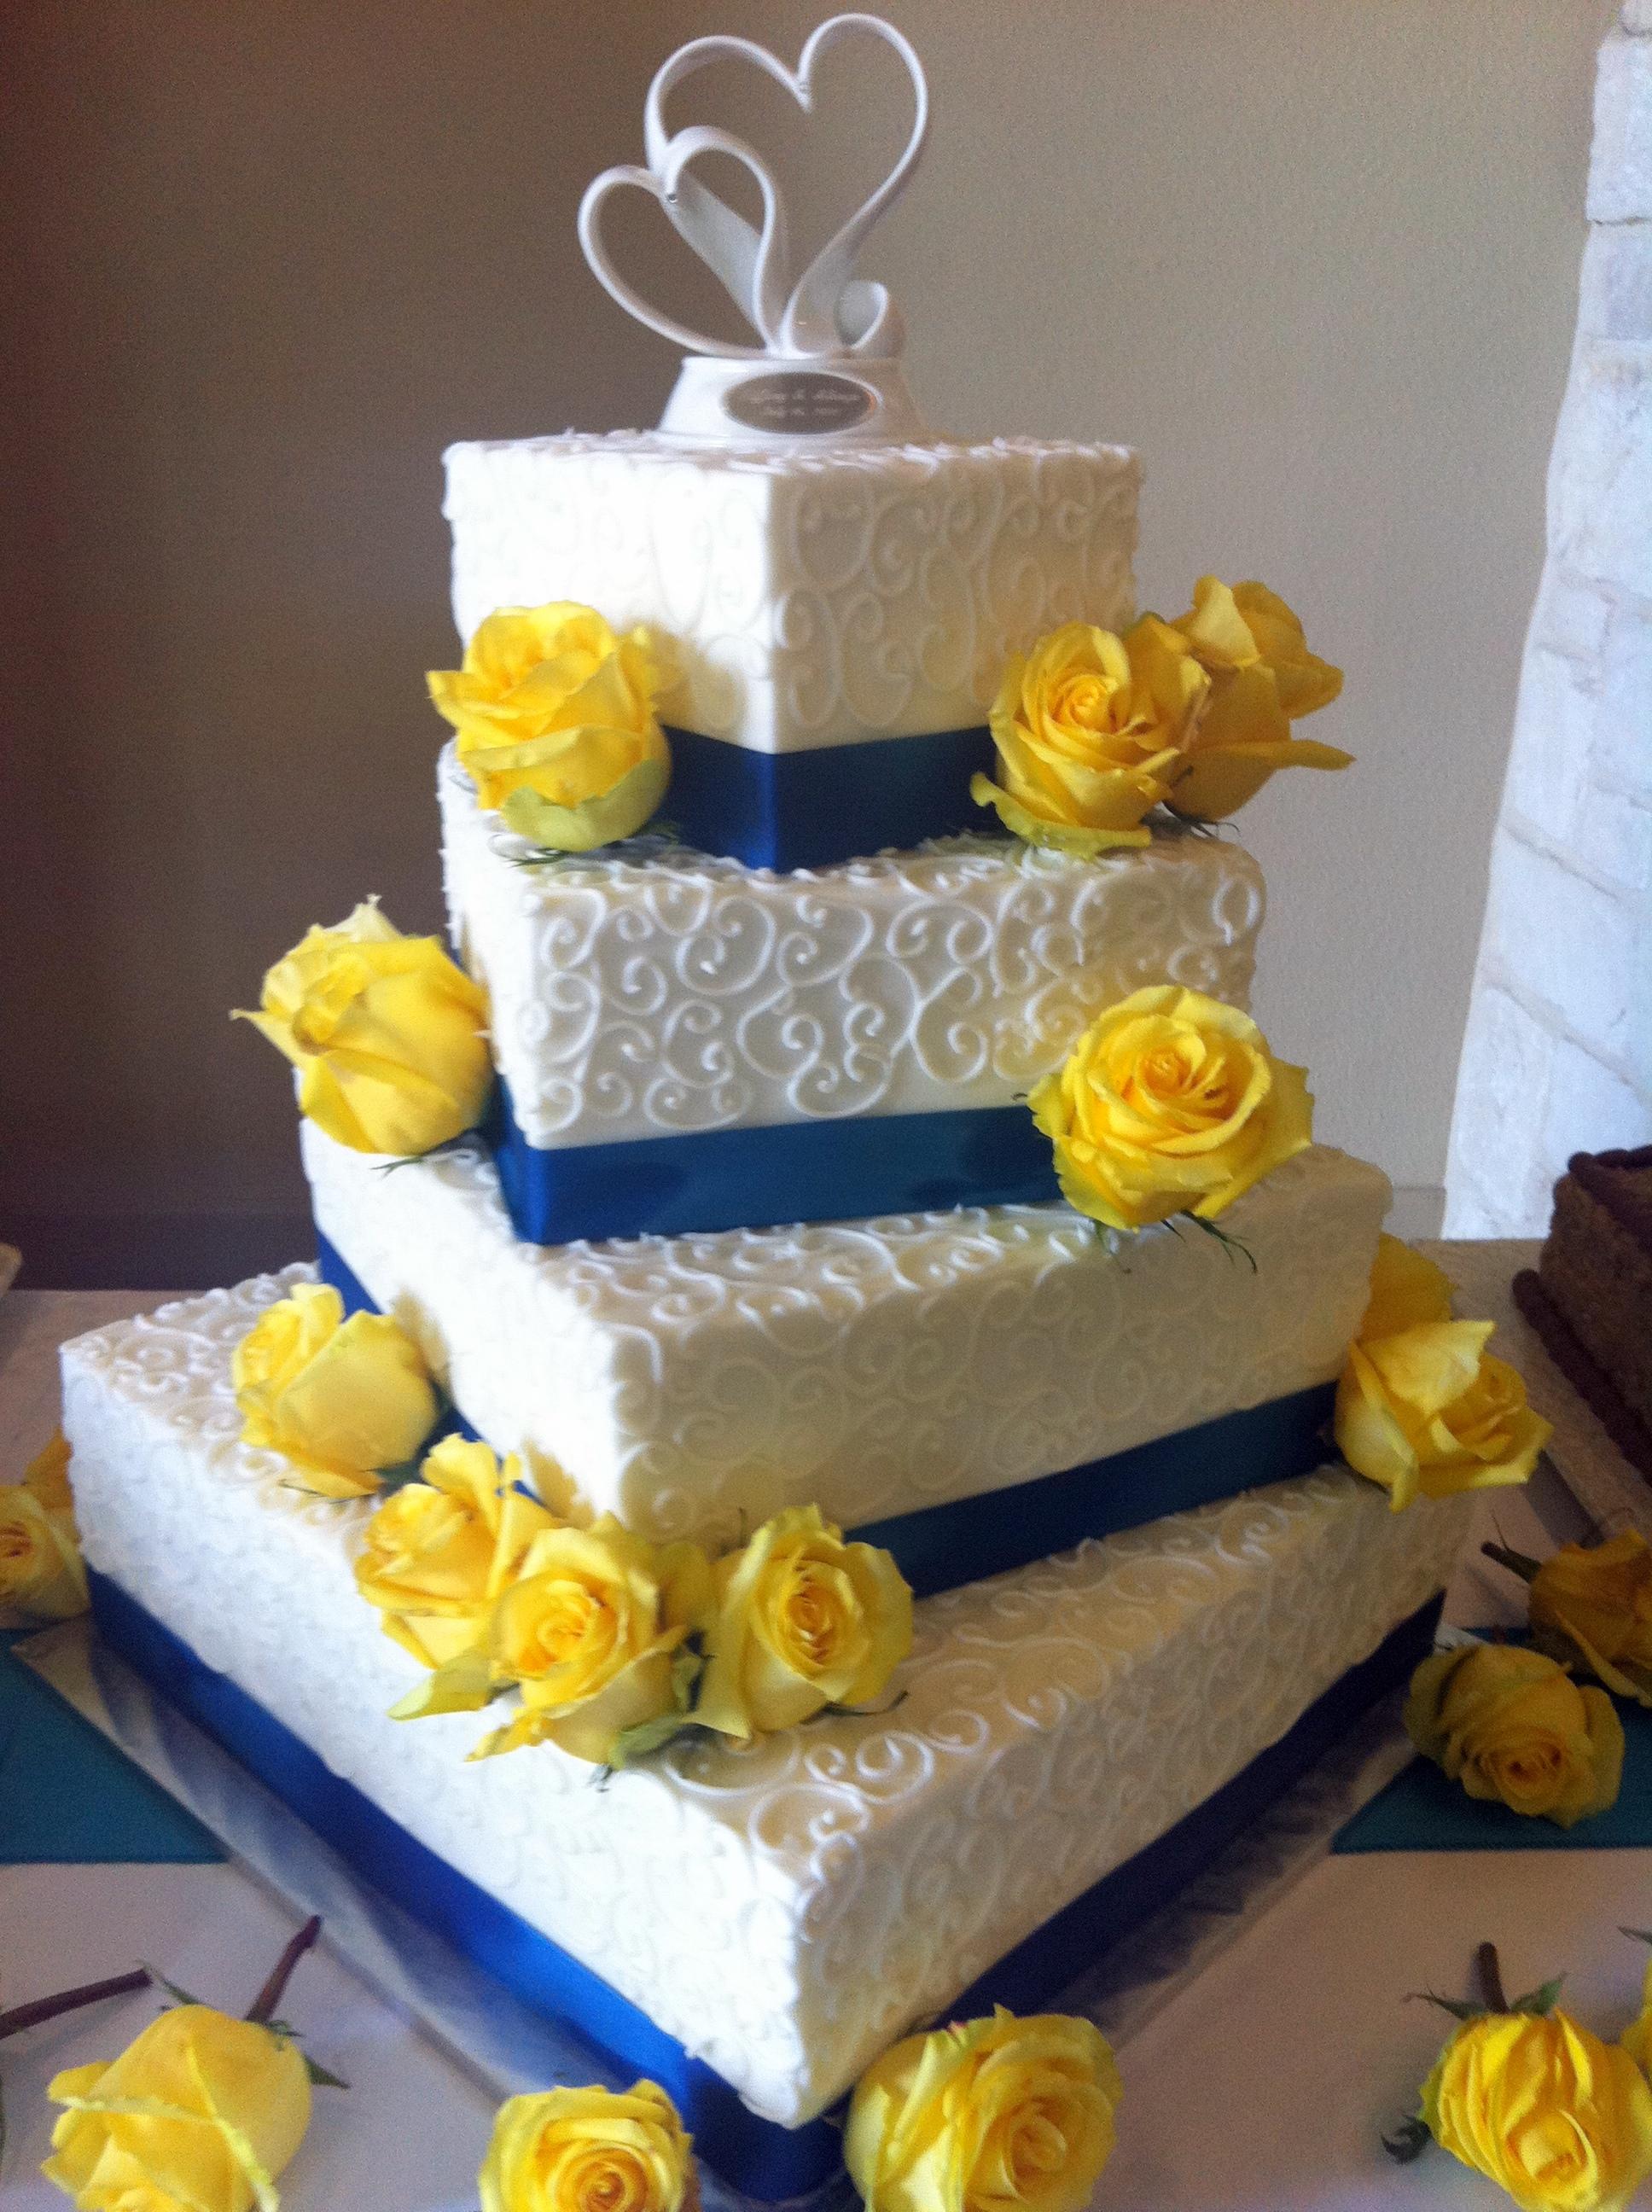 Cake 4306 225 servings